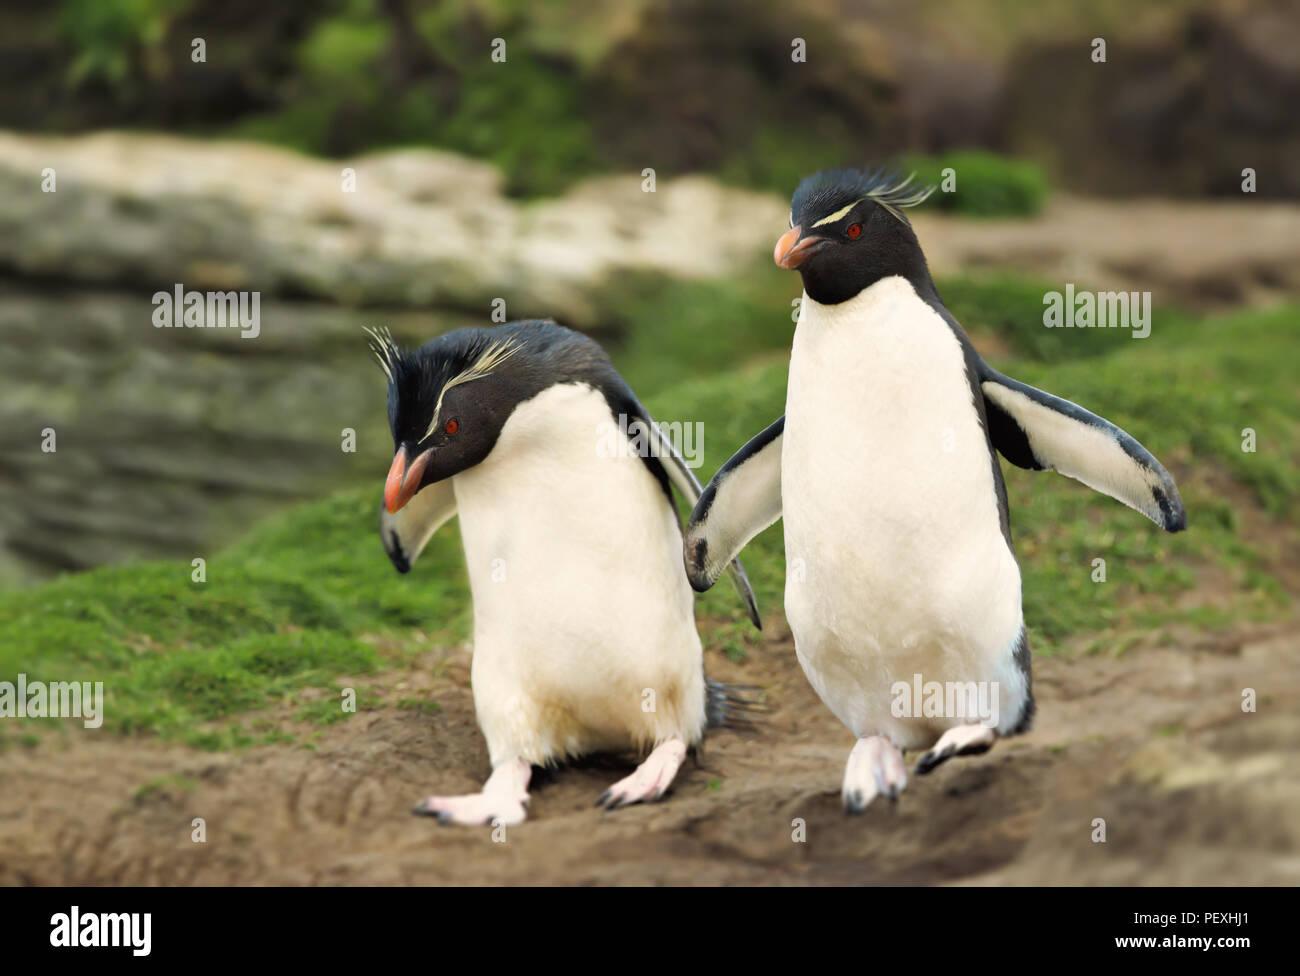 Pingüino penacho Meridional alienta otro pingüino para saltar, Islas Malvinas. Imagen De Stock